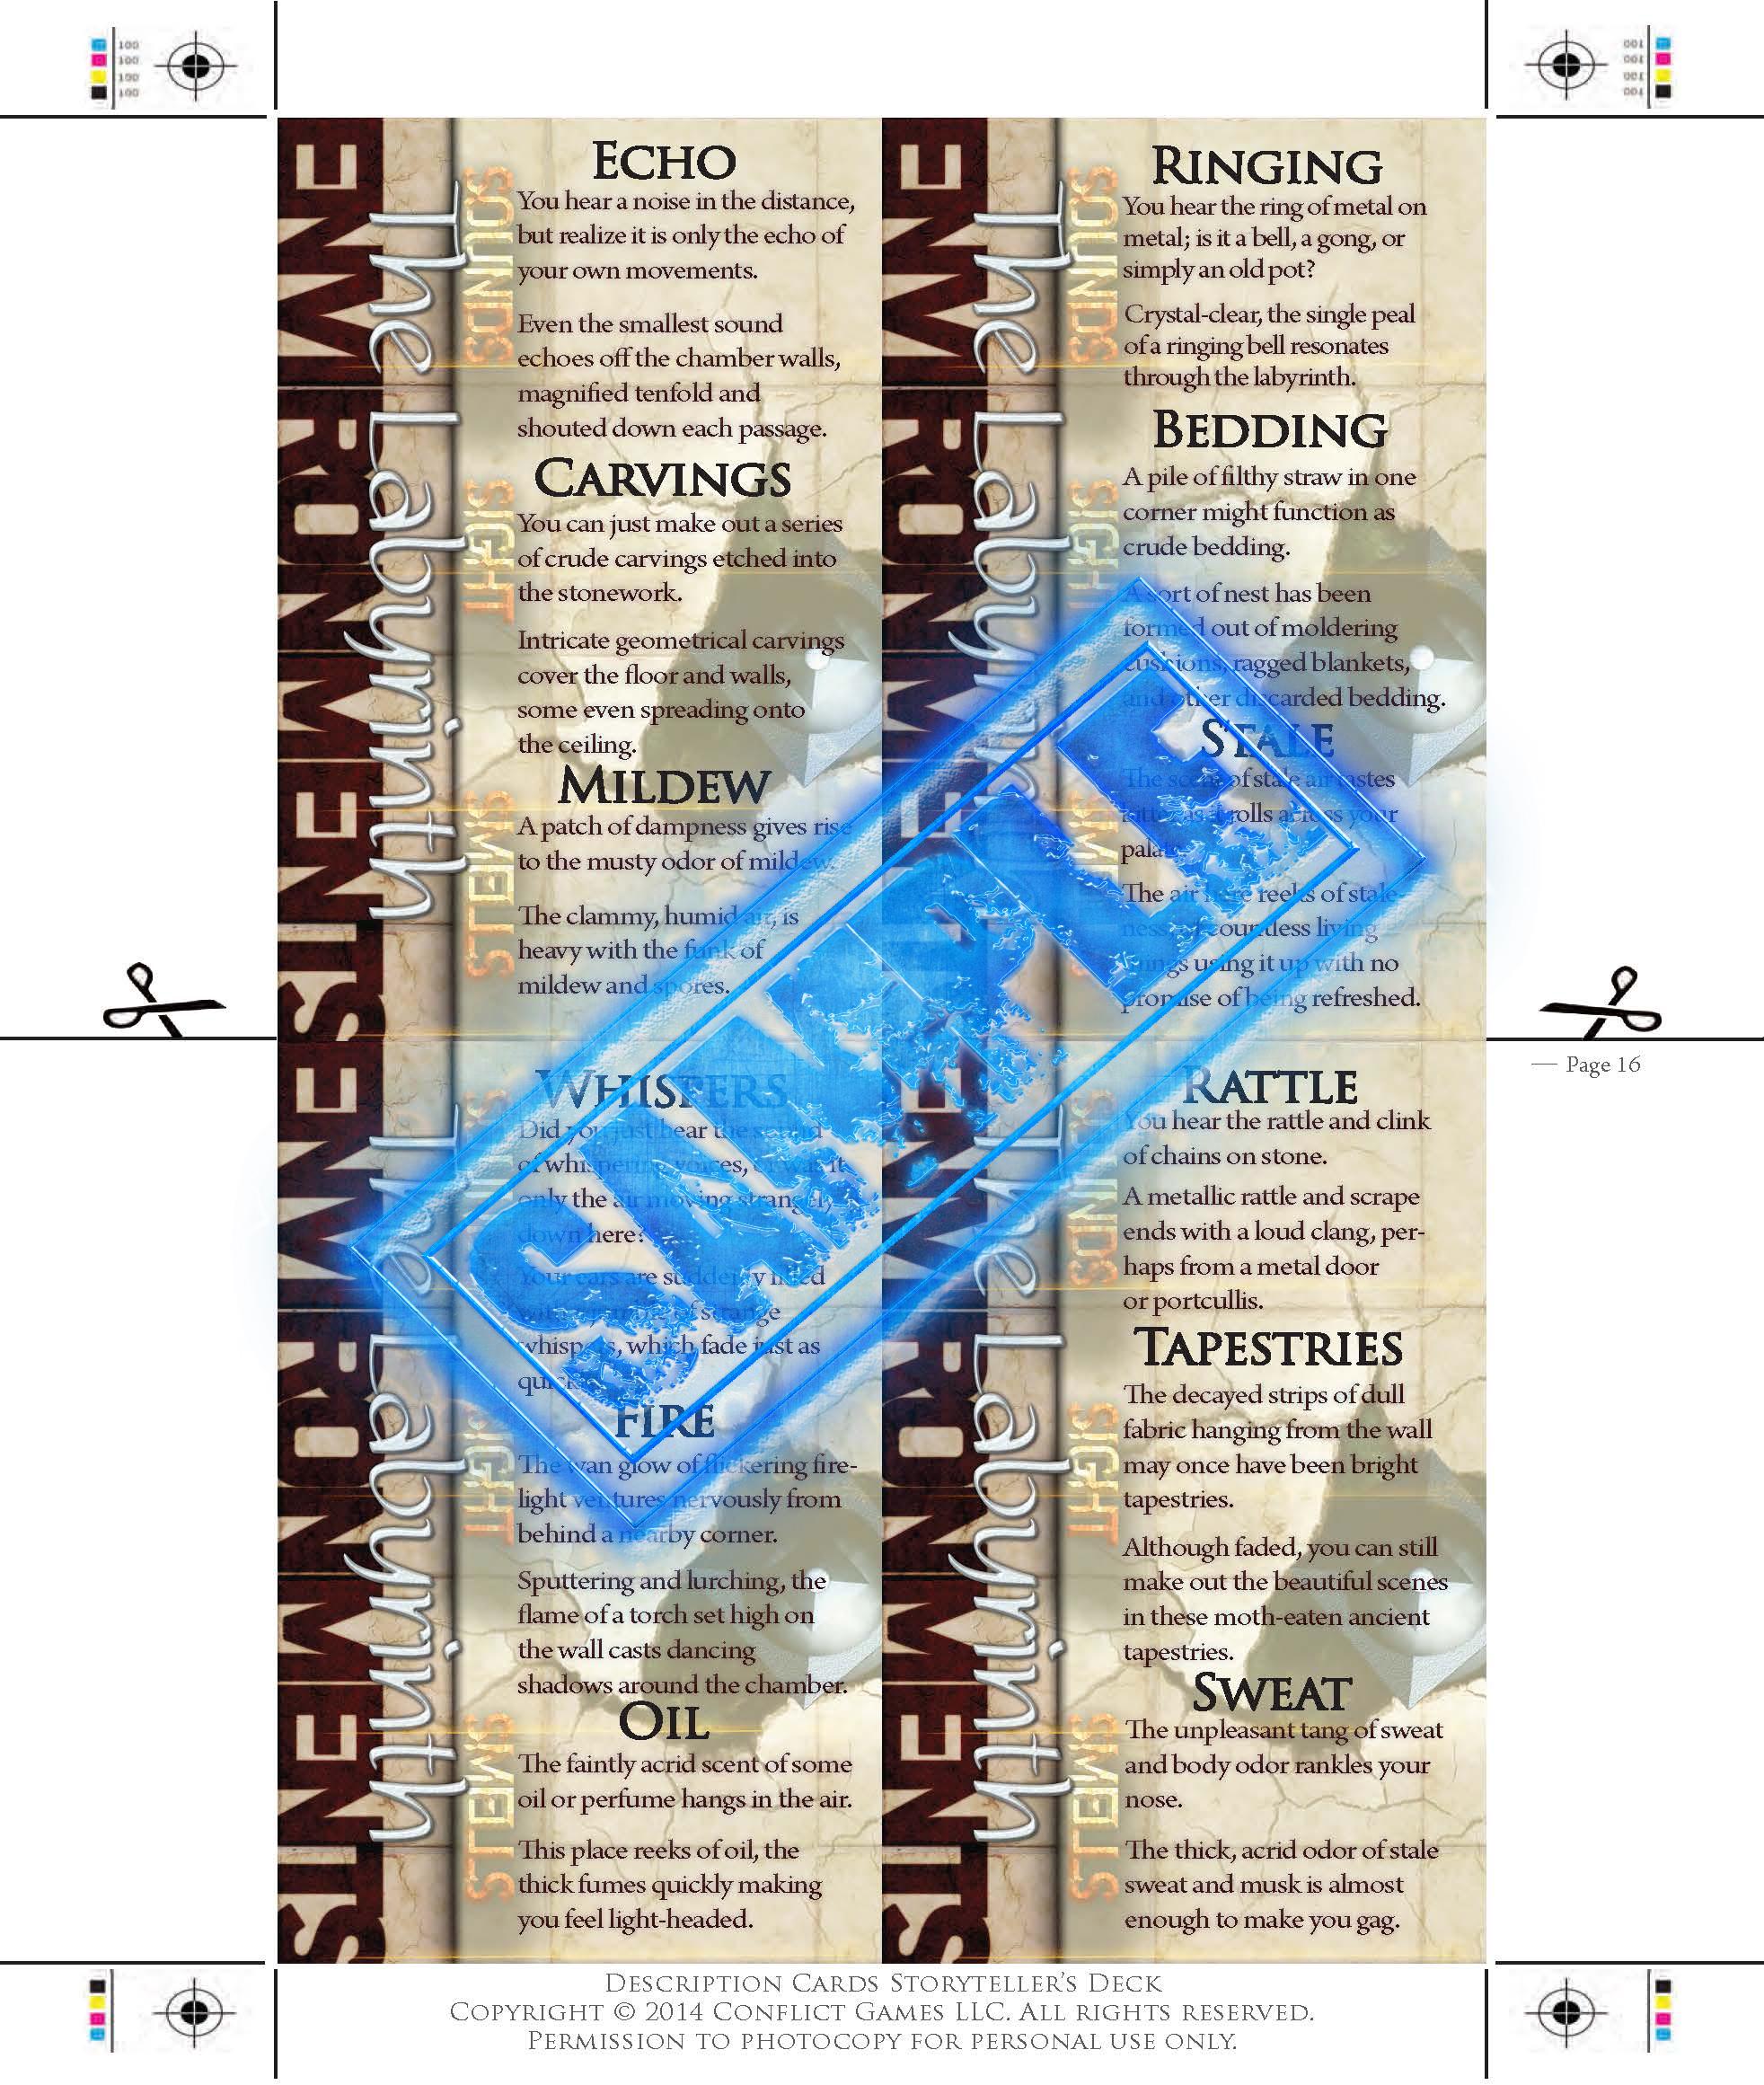 Description Cards - Storytellers Deck - LABYRINTH excerpt